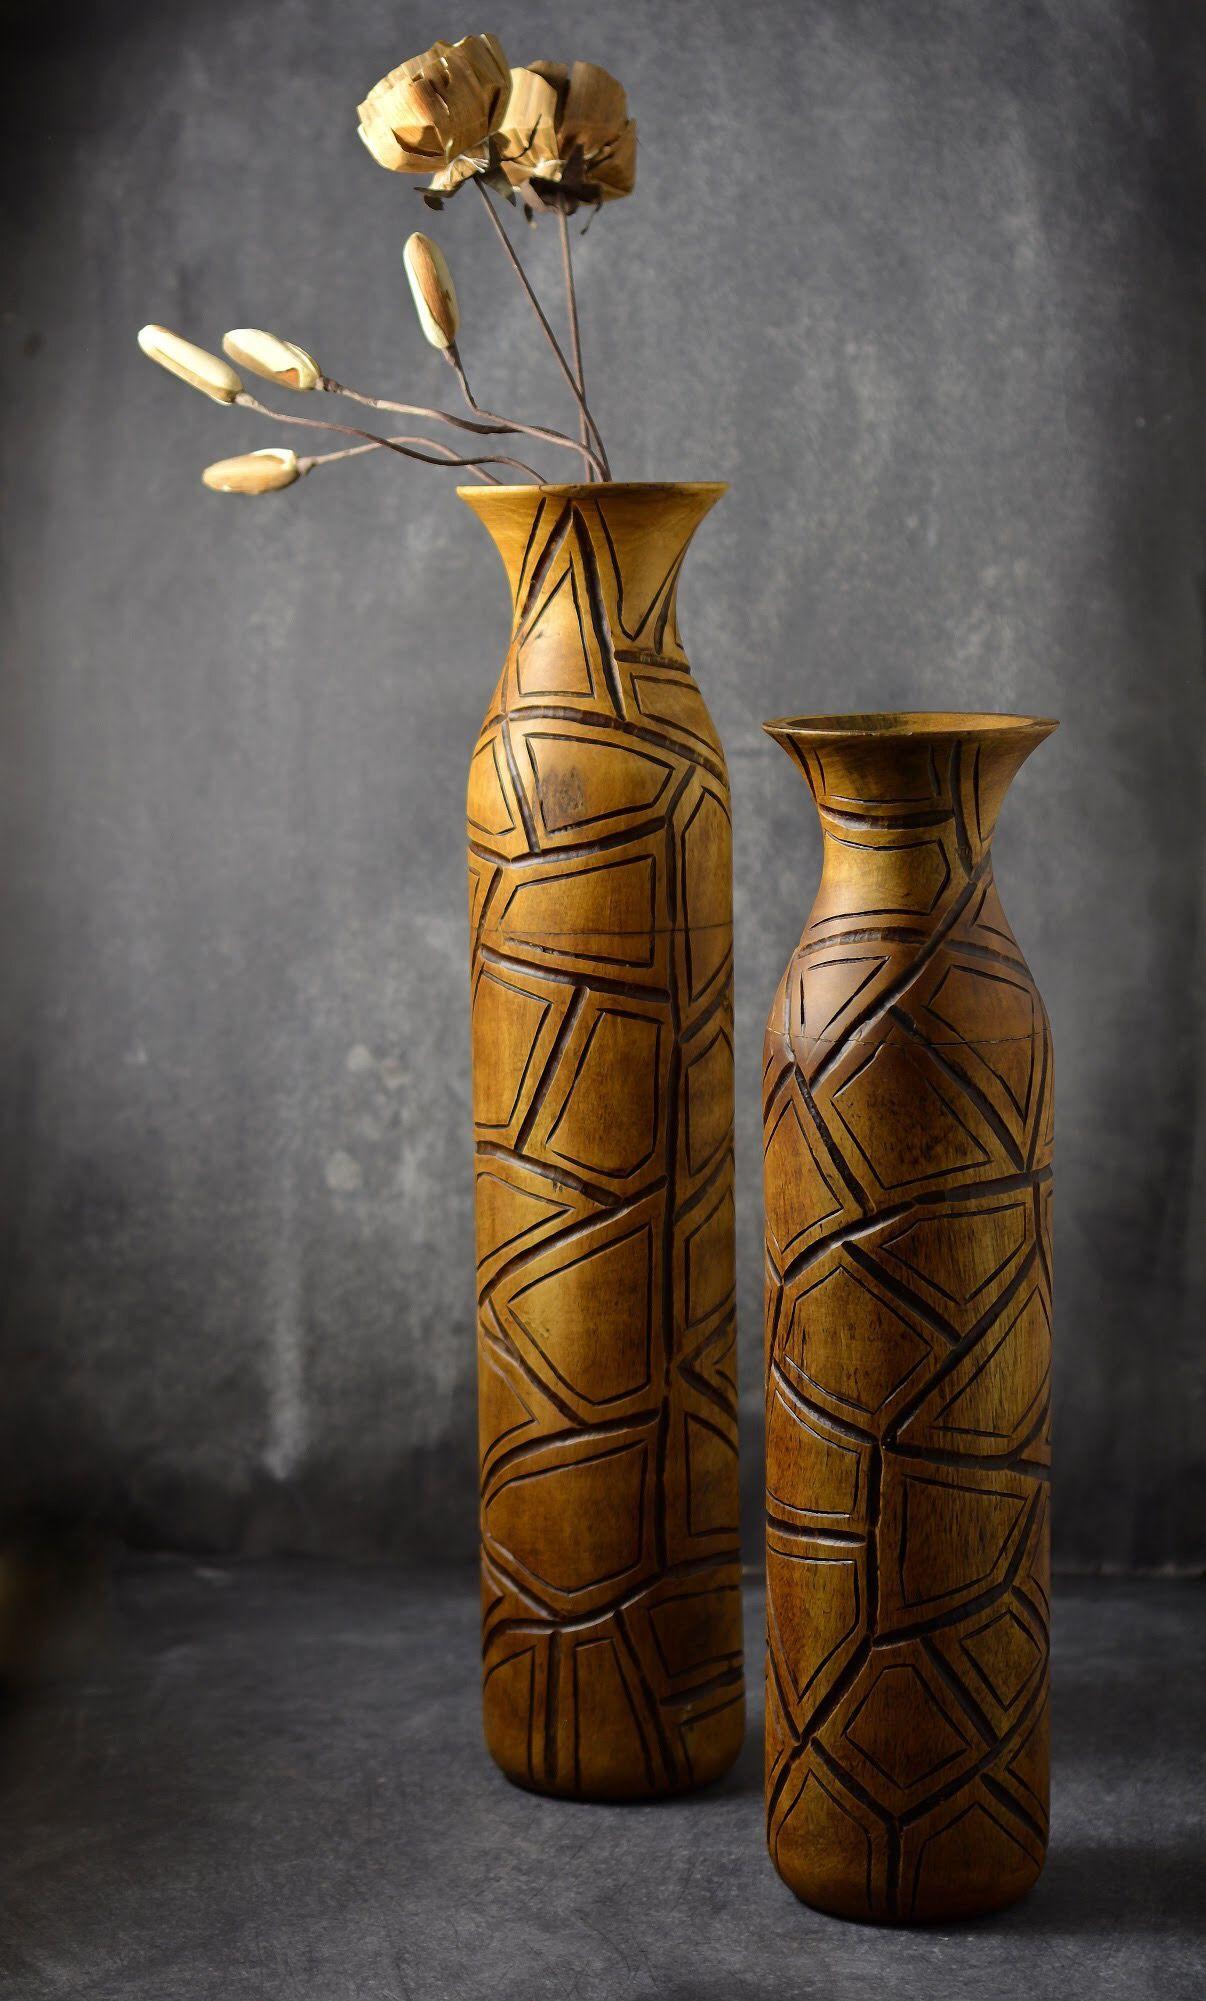 Pin By Deem Home On فازات و مزهريات خشب Vase Decor Home Decor